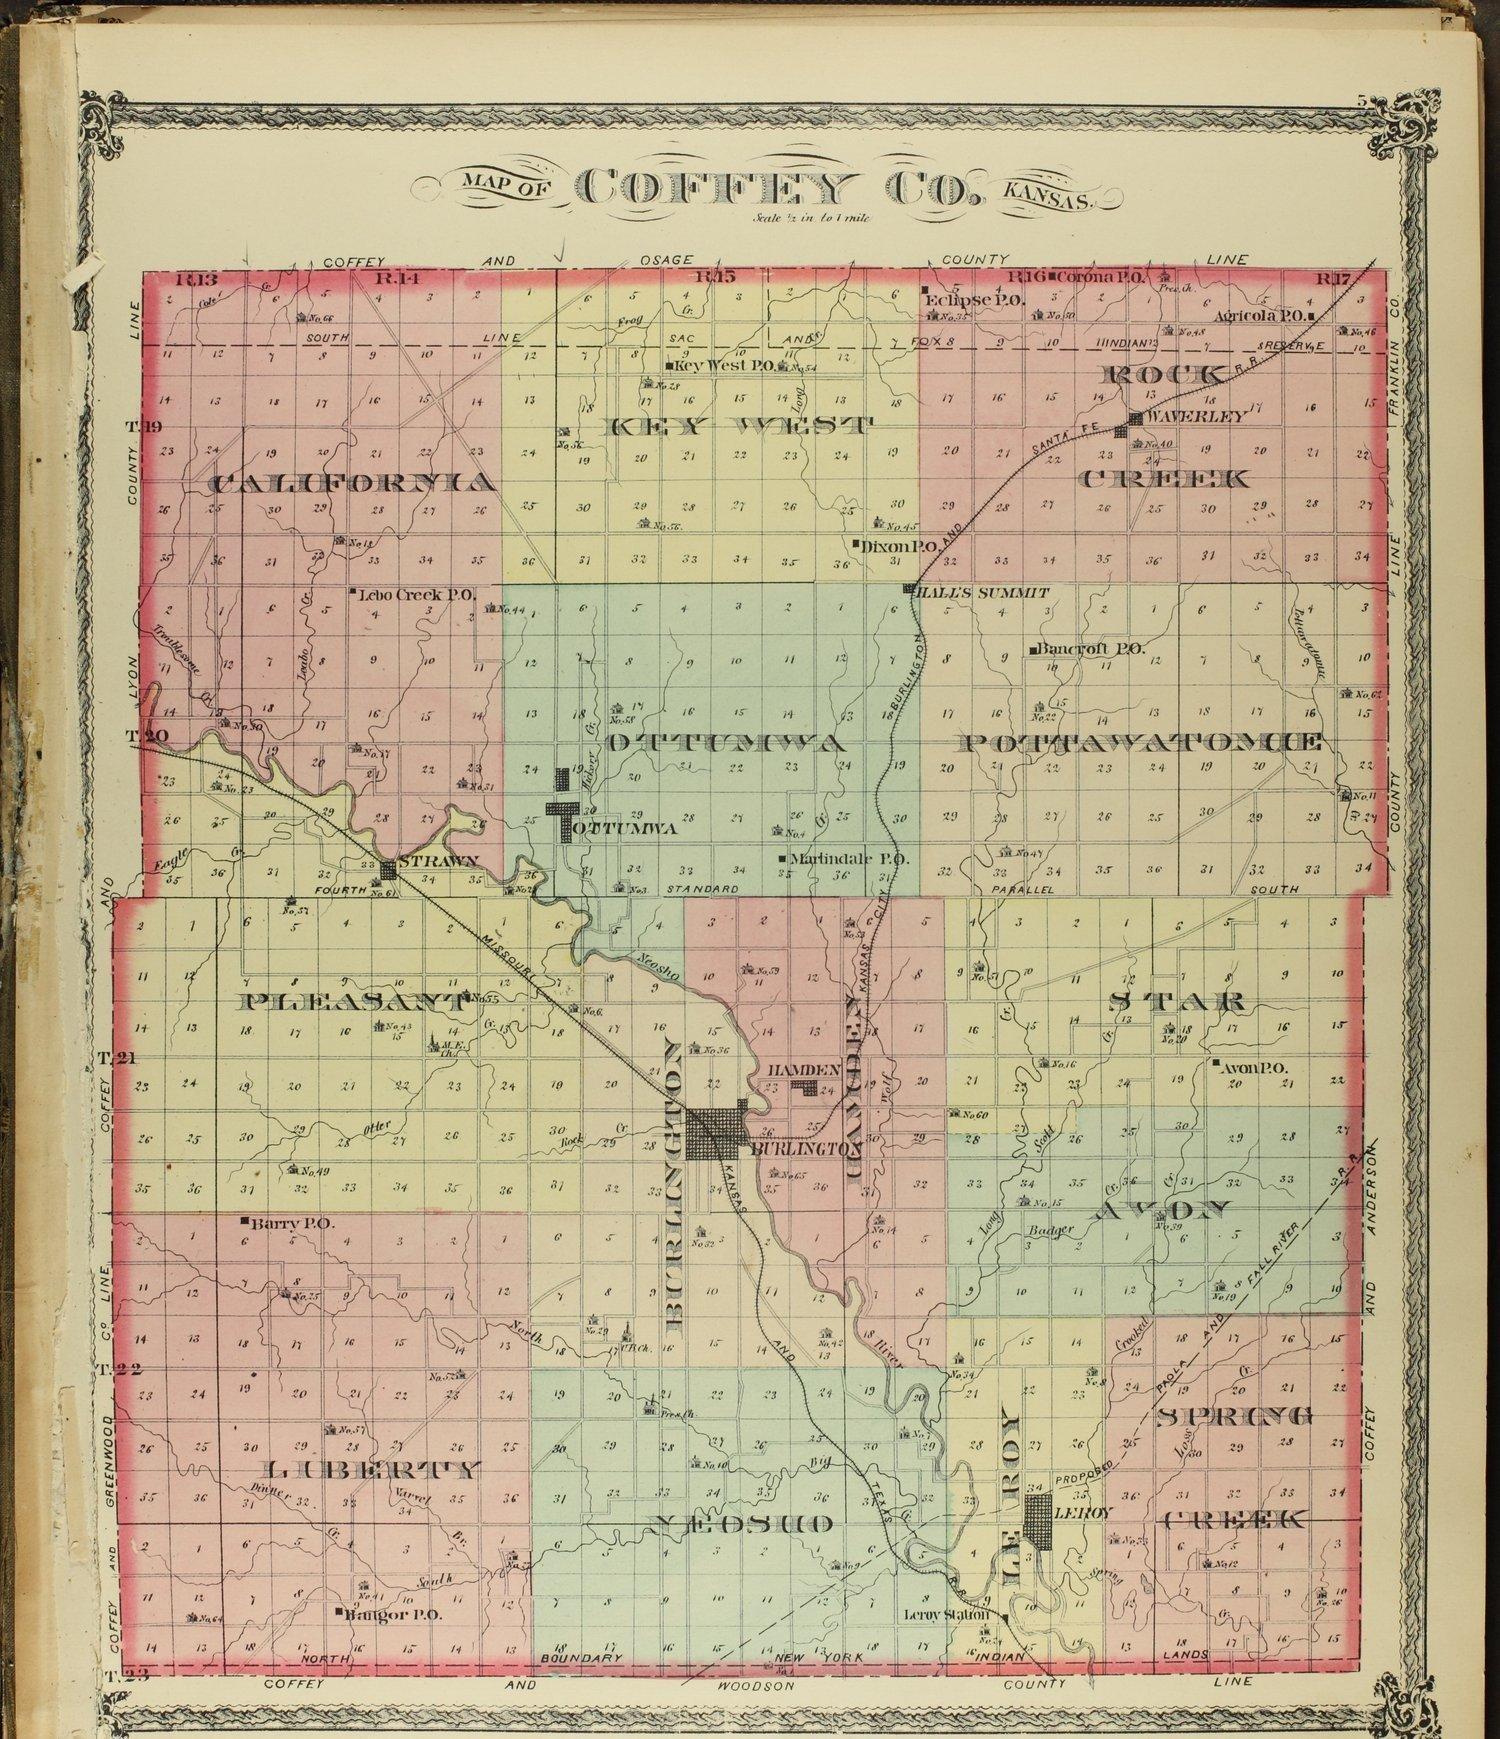 An illustrated historical atlas of Coffey County, Kansas - 5